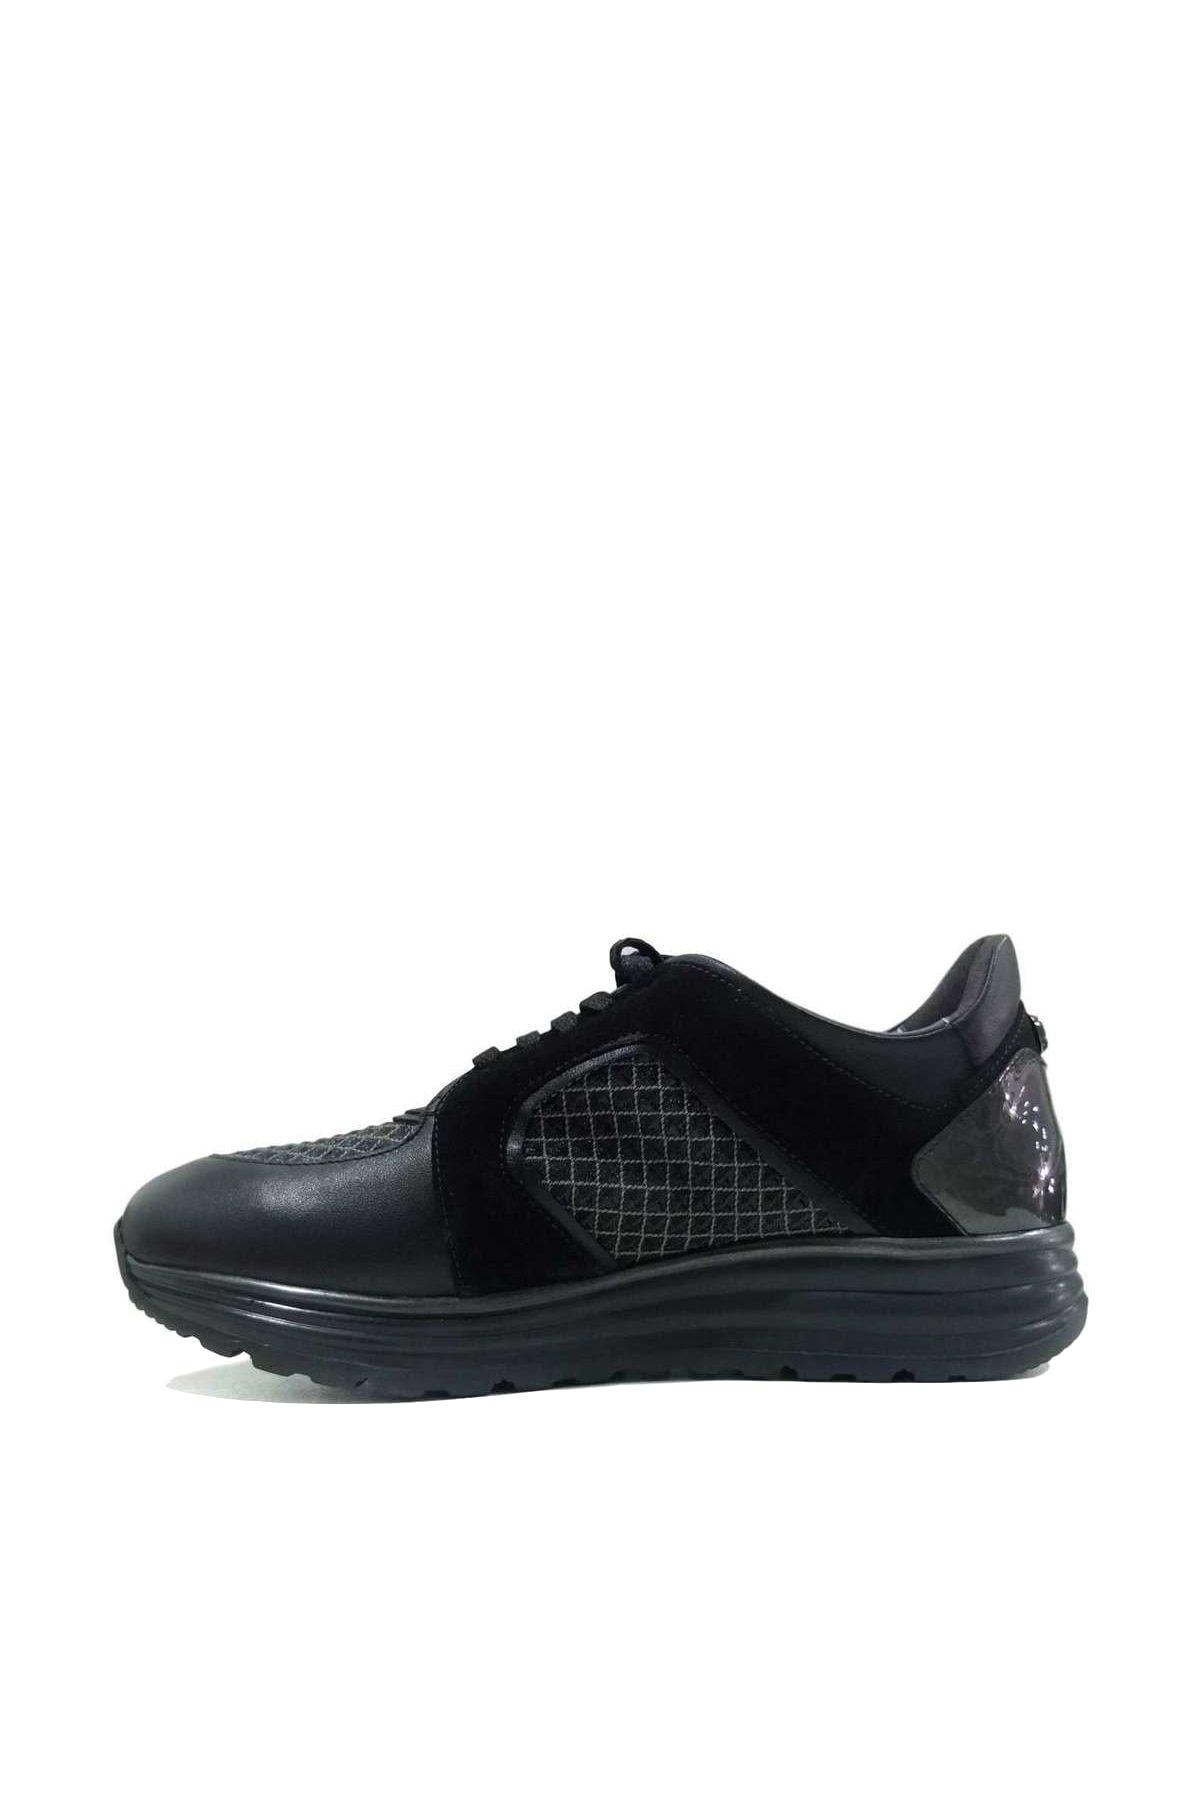 ALBERTO GUARDIANI Kadın Siyah Casual Ayakkabı Sd59431E-Ax00 2